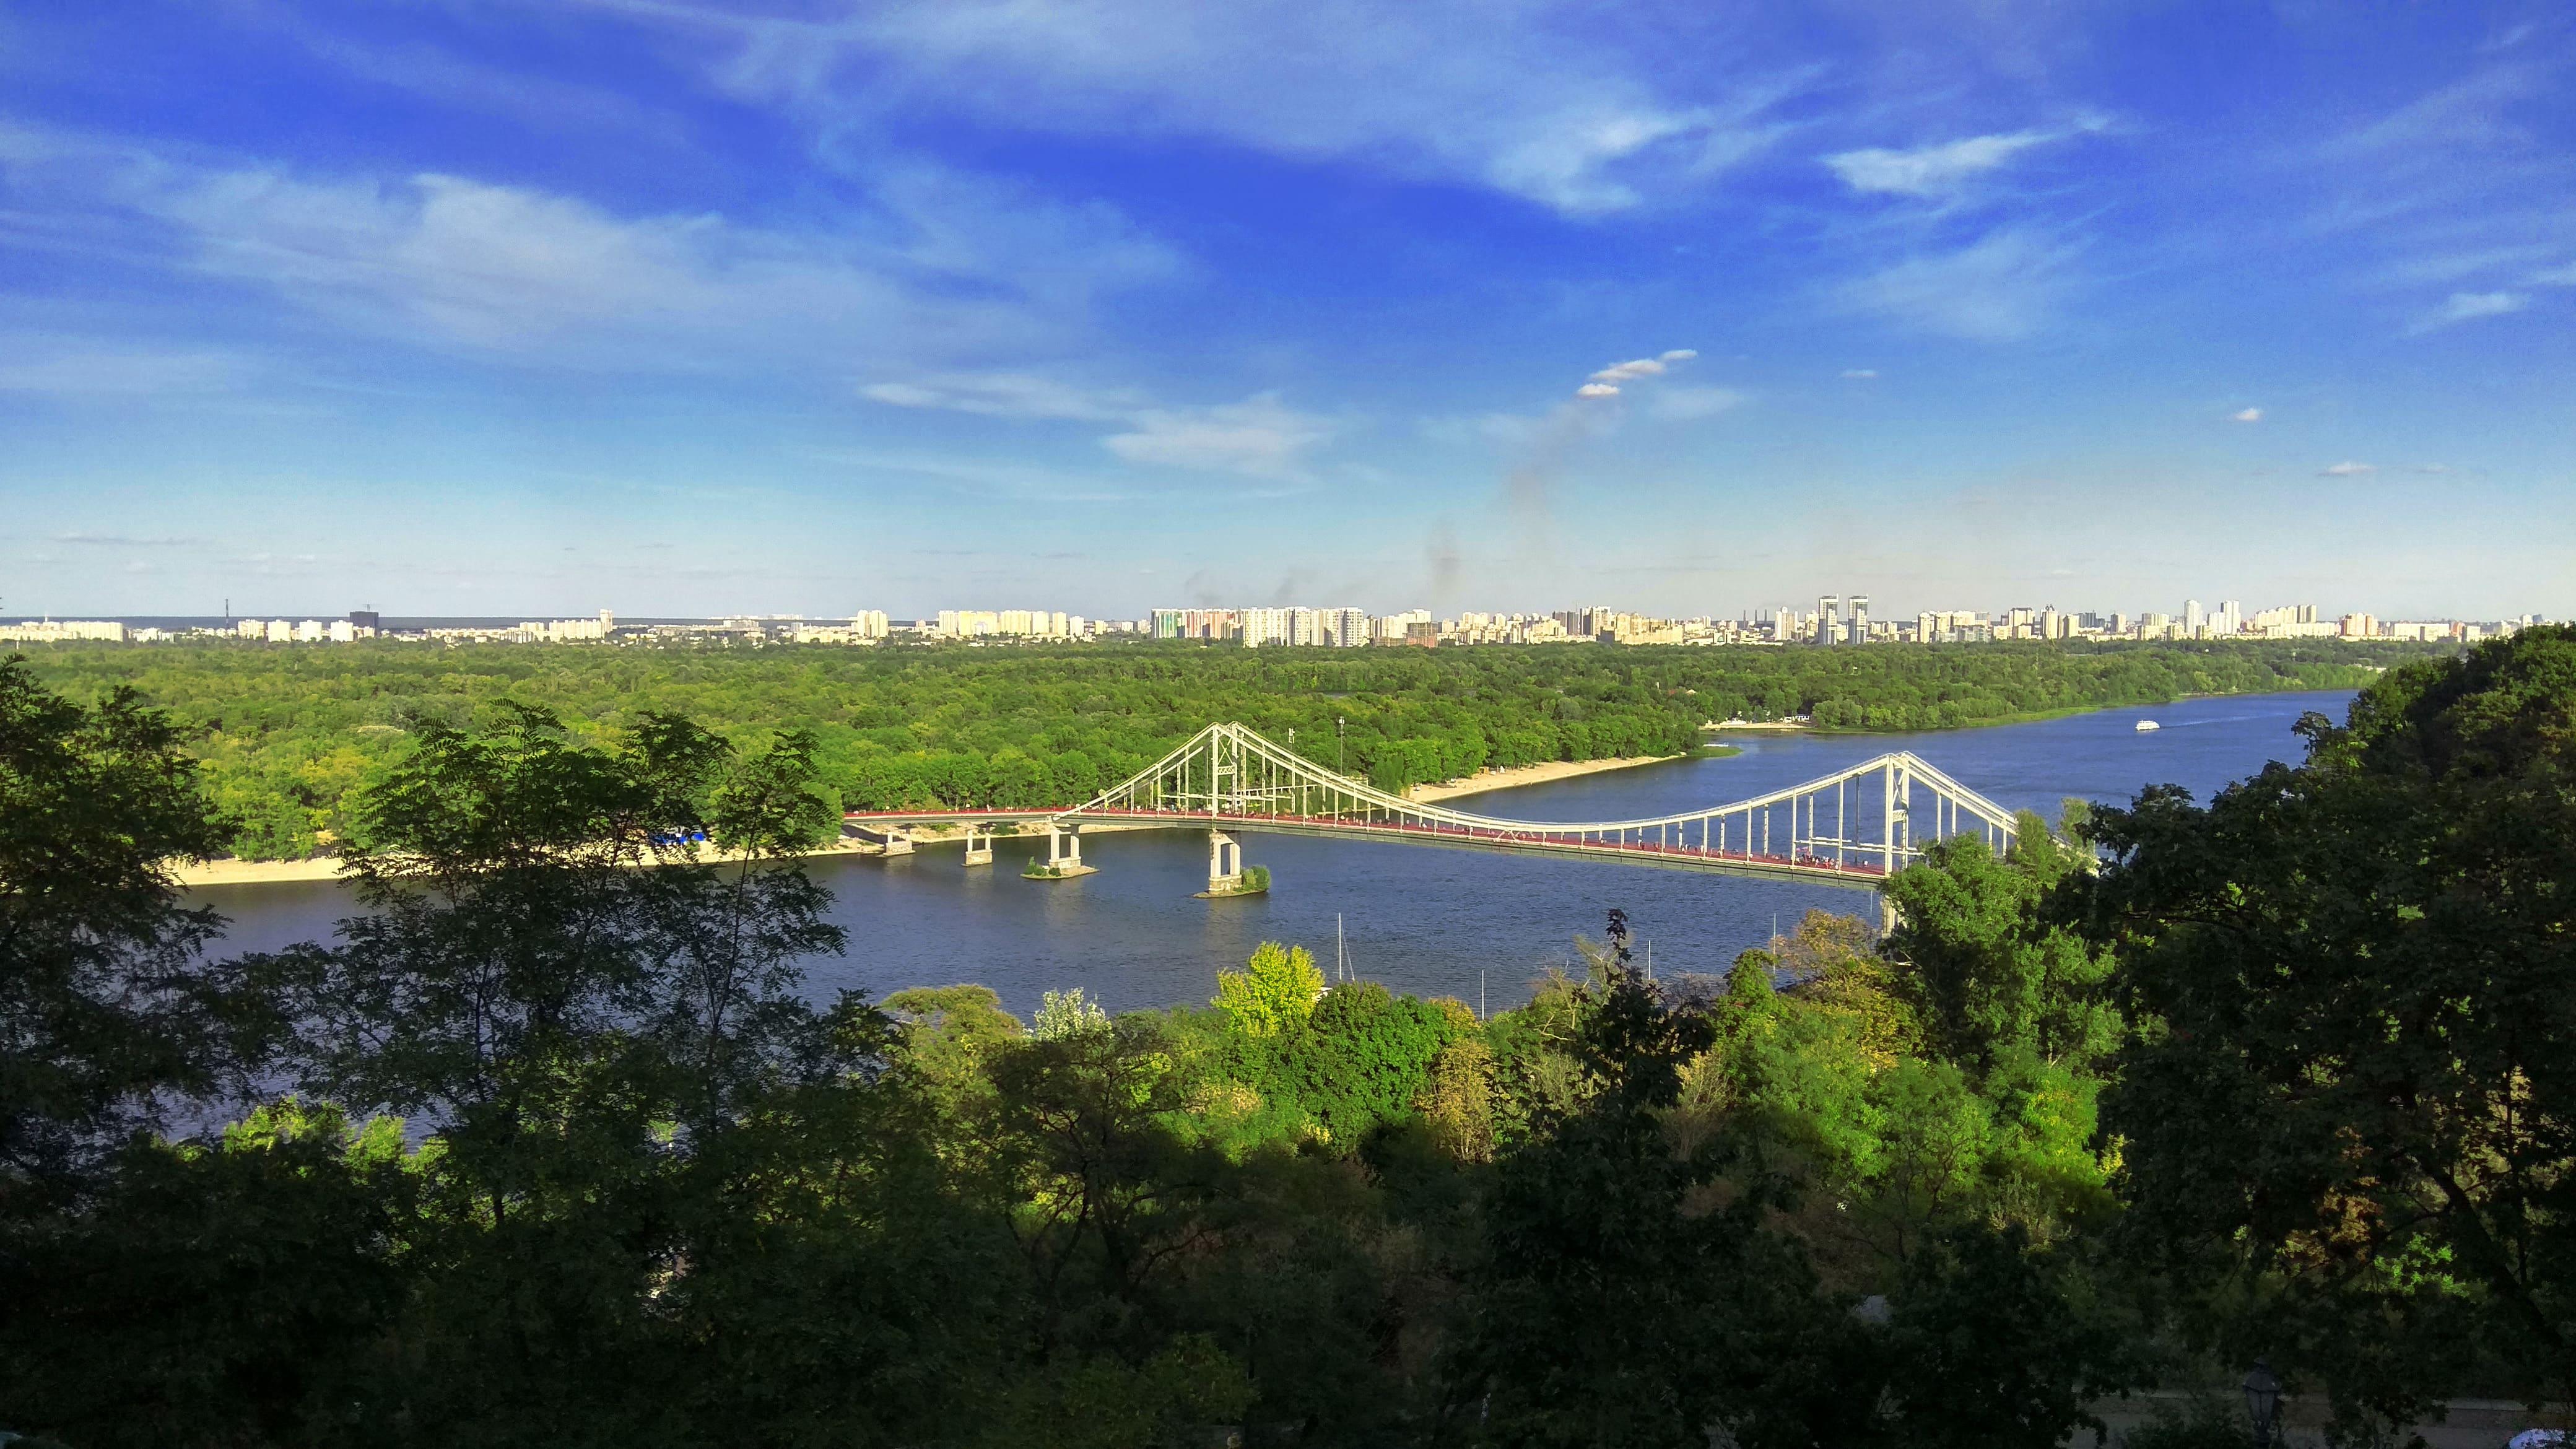 HDoboi.Kiev.ua - Река Днепр в Киеве